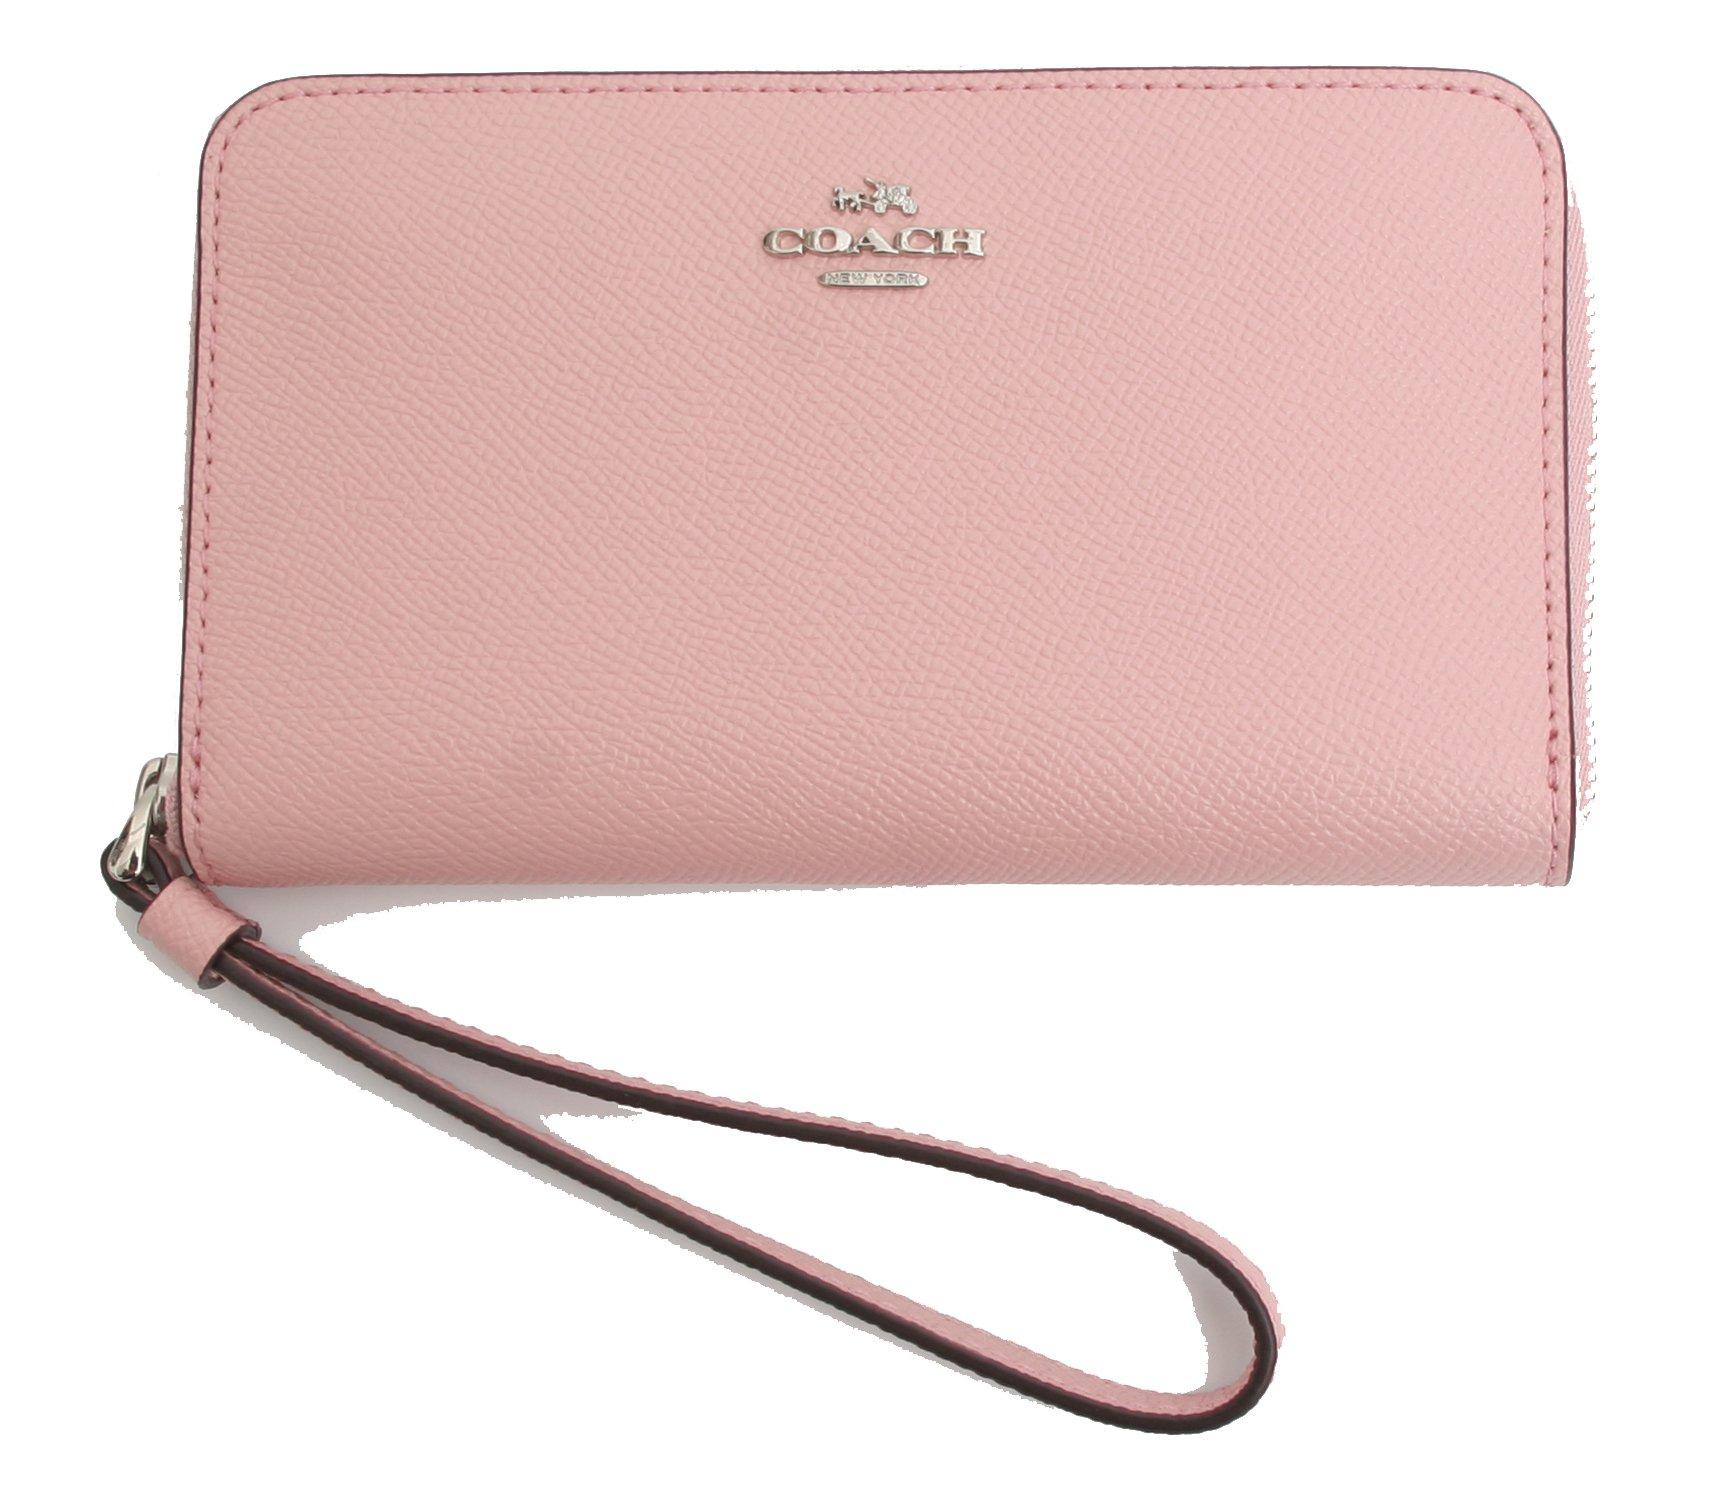 Coach Crossgrain Leather Phone Wallet Wristlet by Coach